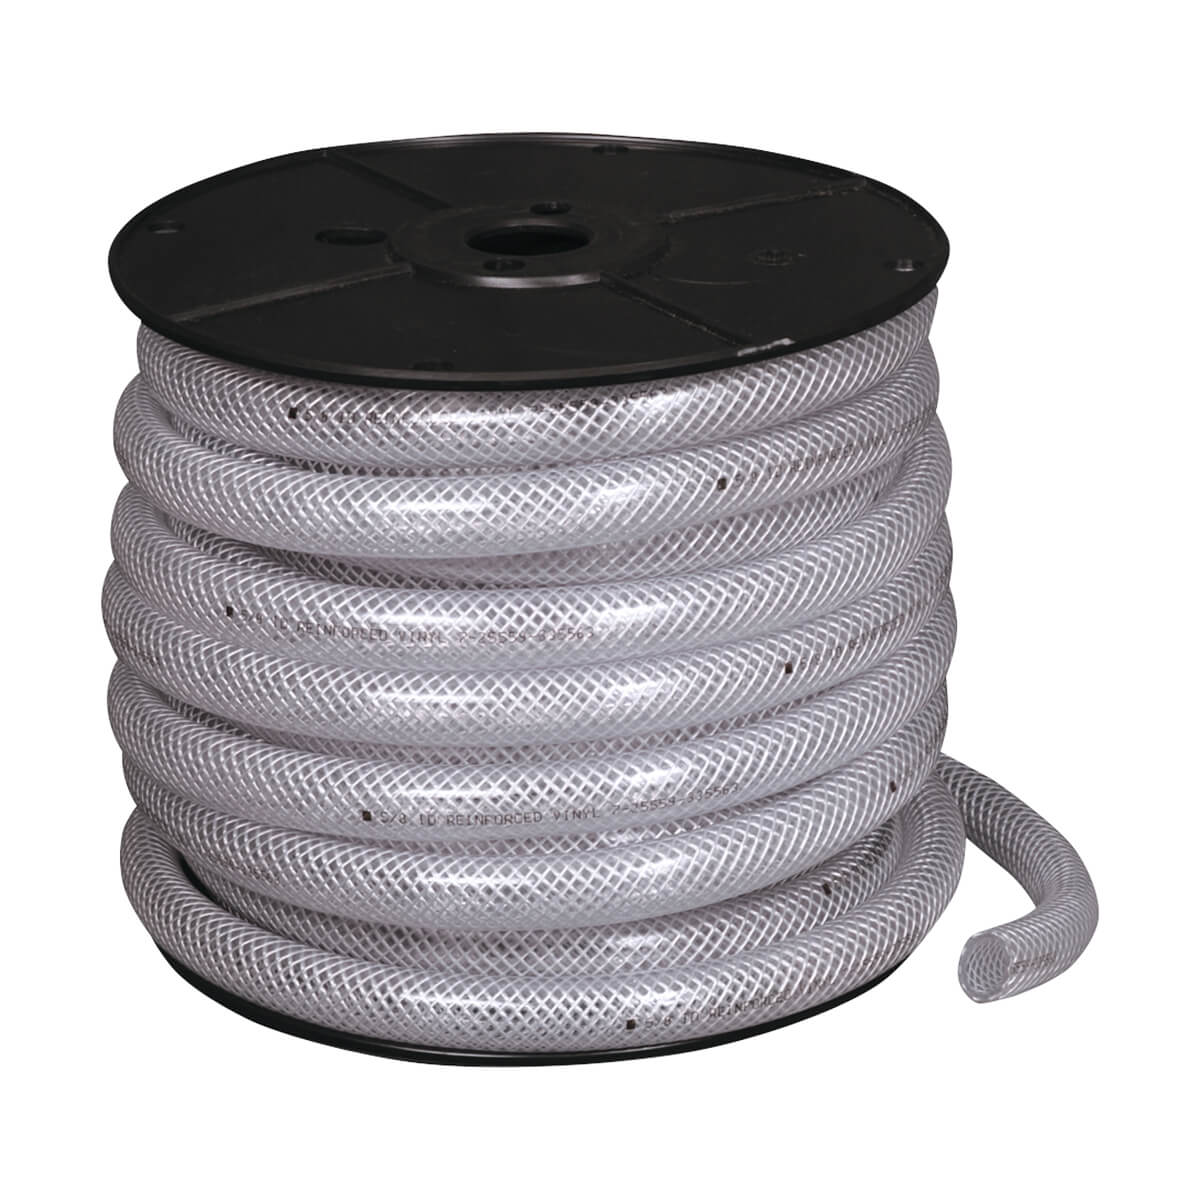 Reinforced Clear Vinyl Tubing — Bulk - 1-1/2-in - Price Per Ft